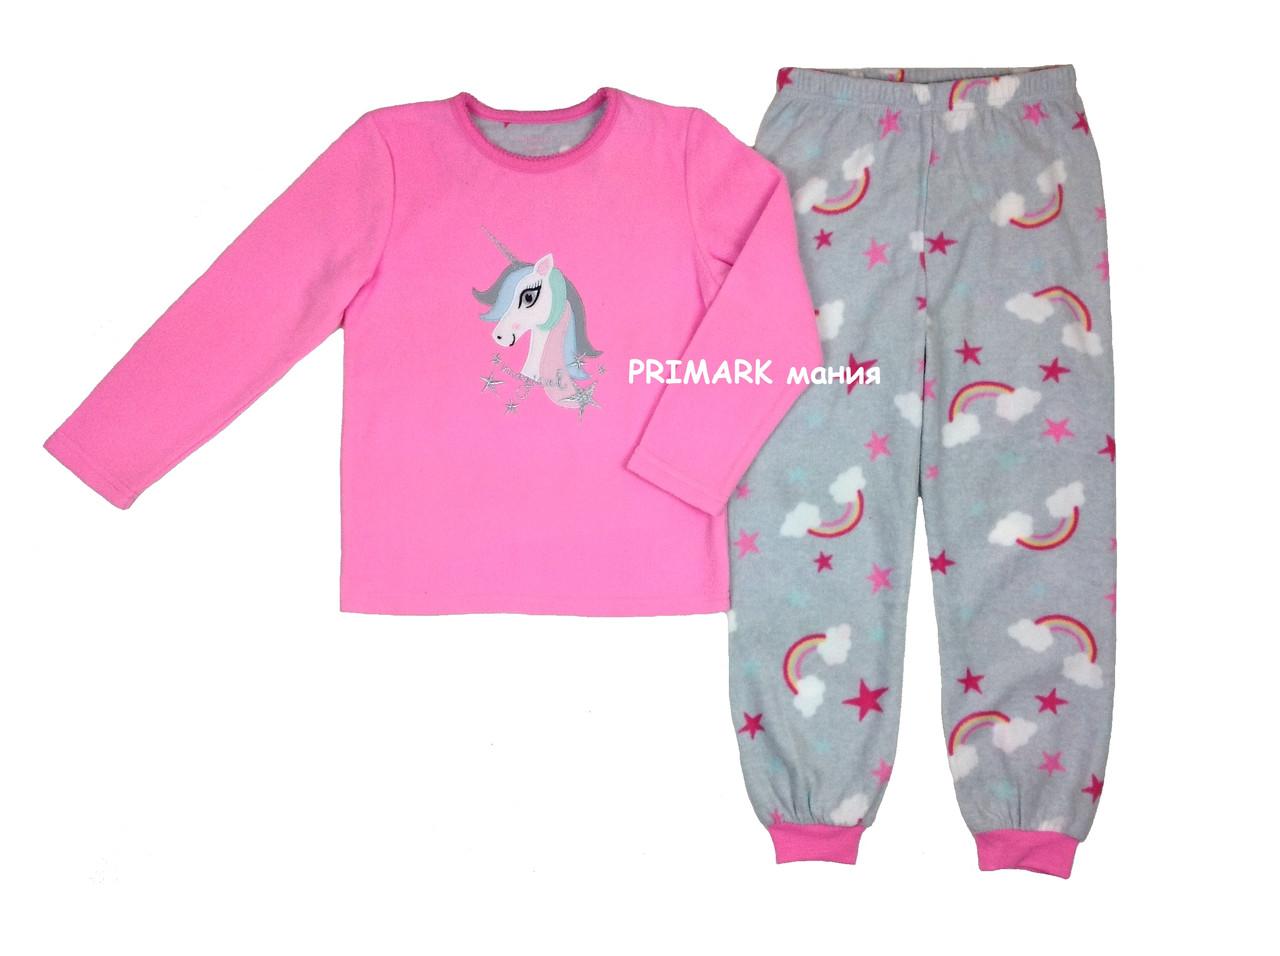 Флисовая пижама для девочки Единорог Primark  продажа e4b47c0615b14